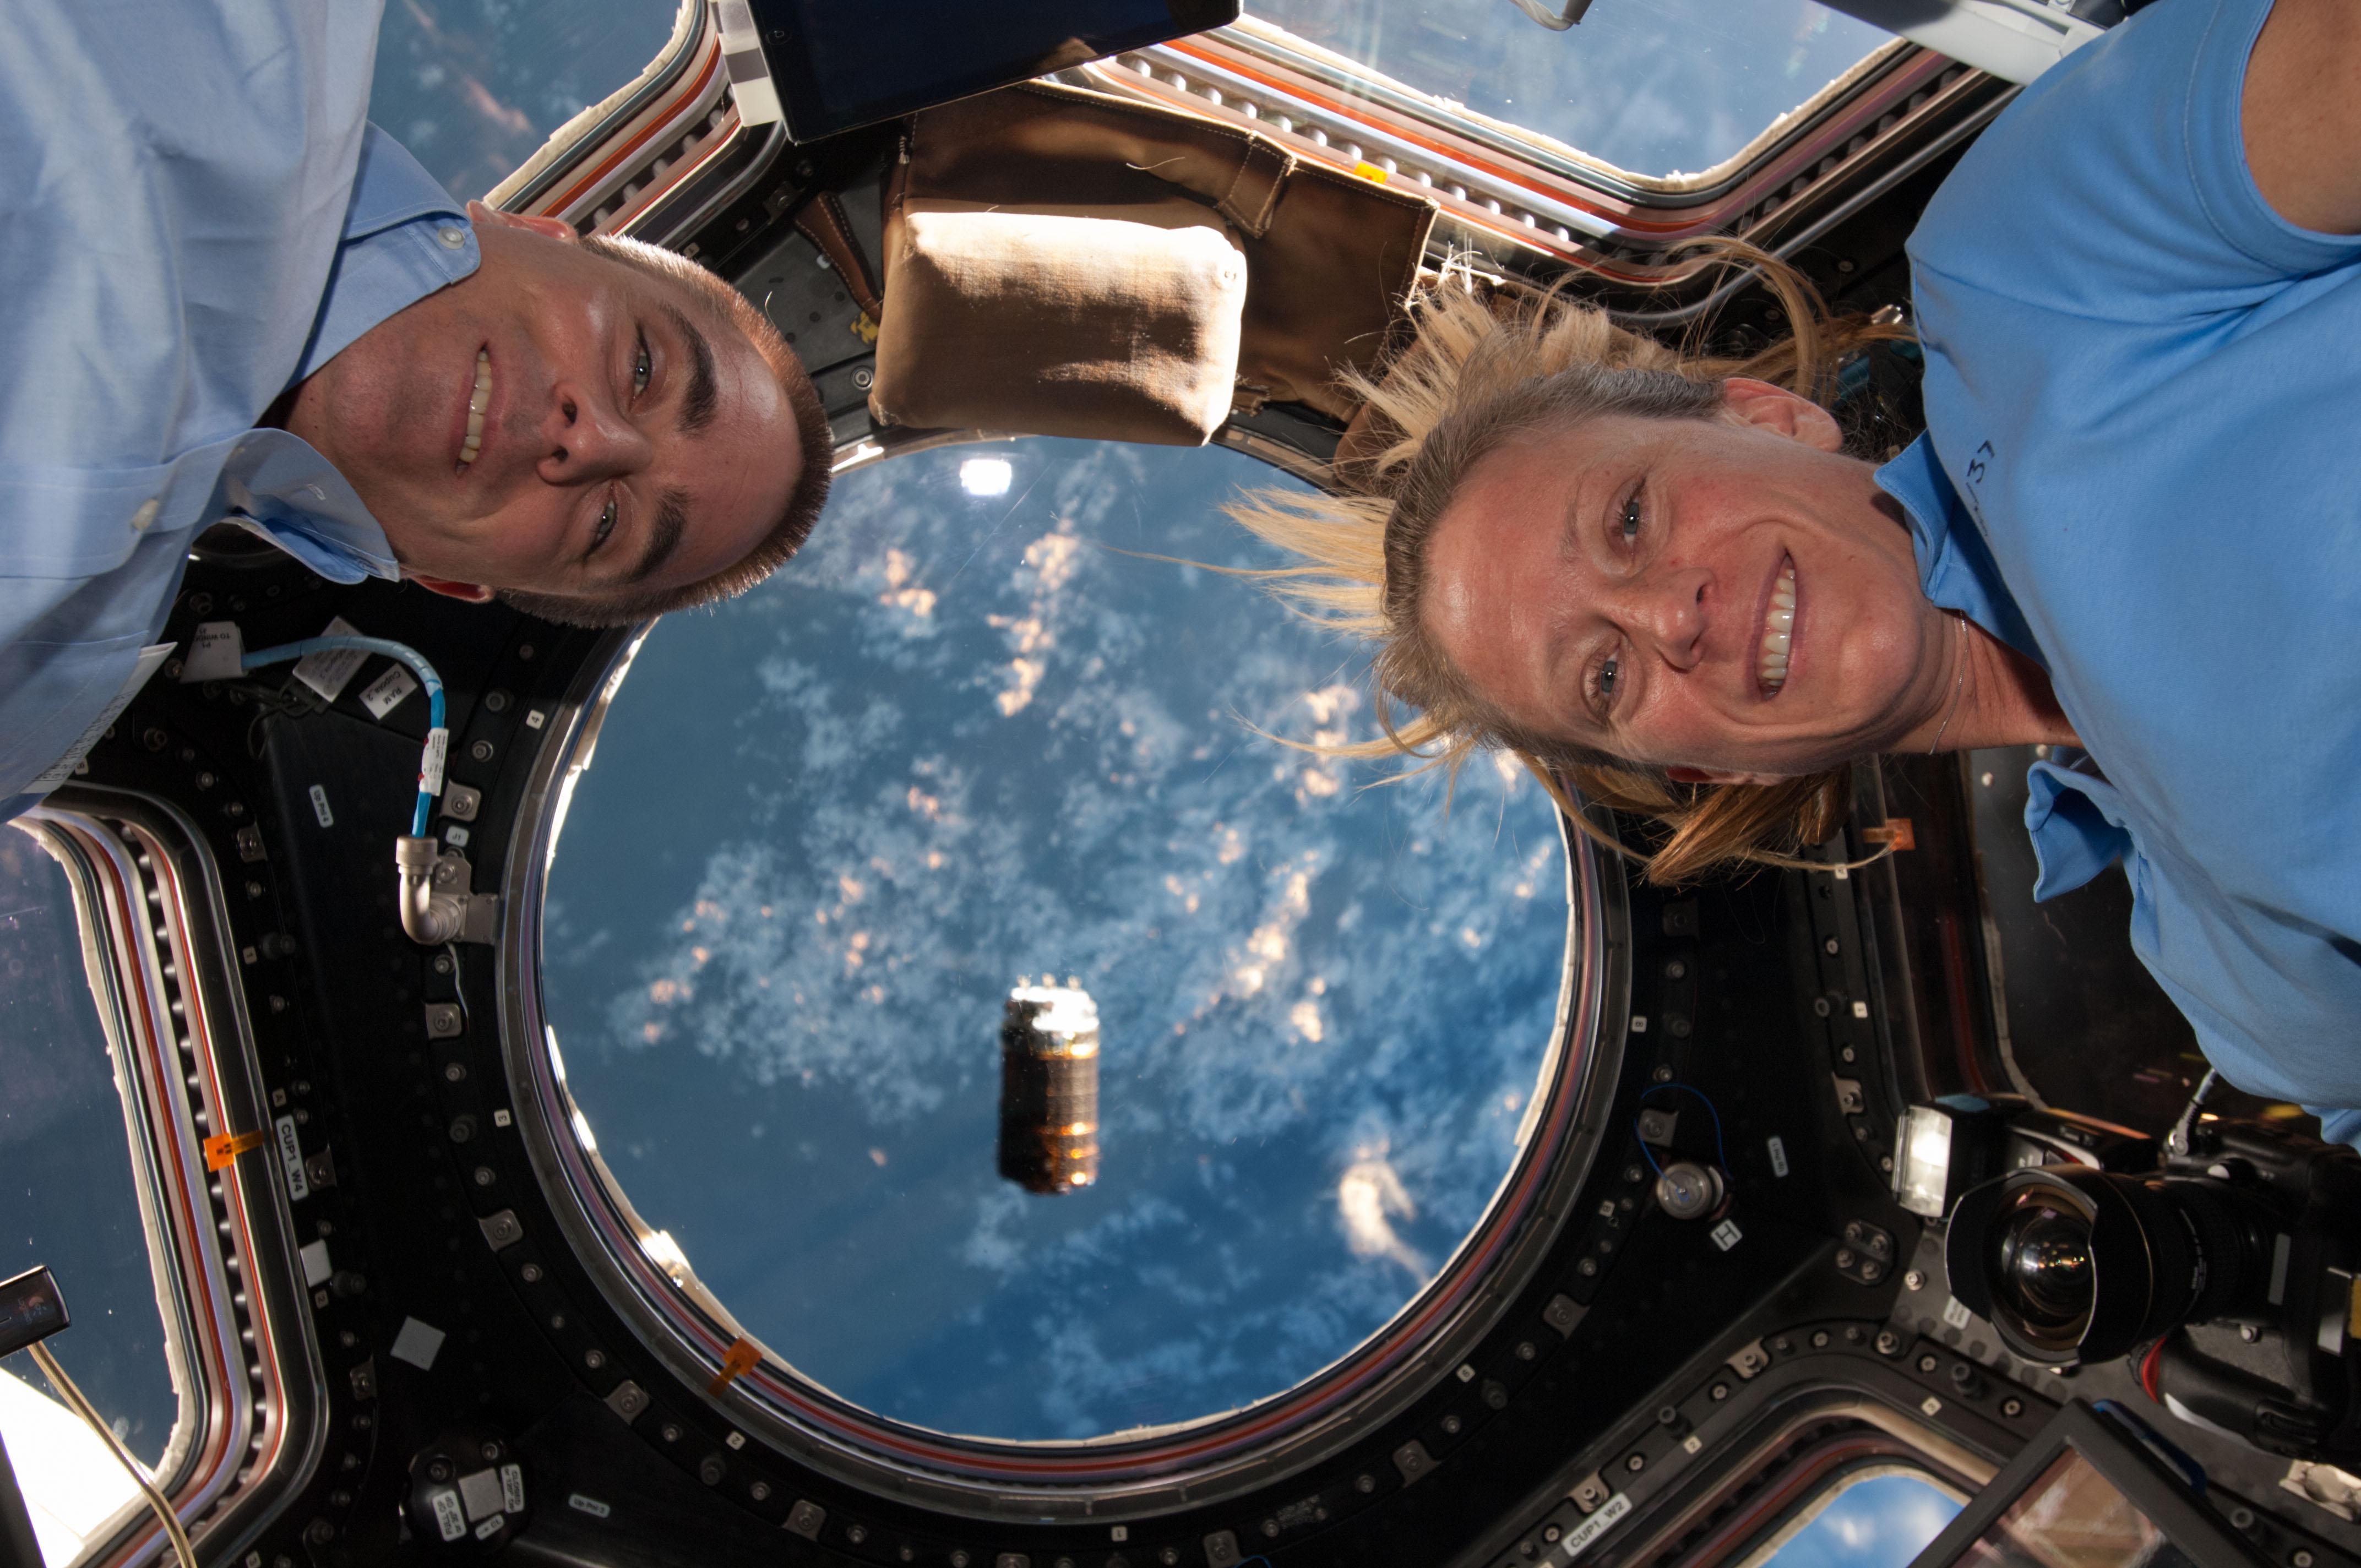 chris nyberg astronaut - photo #1